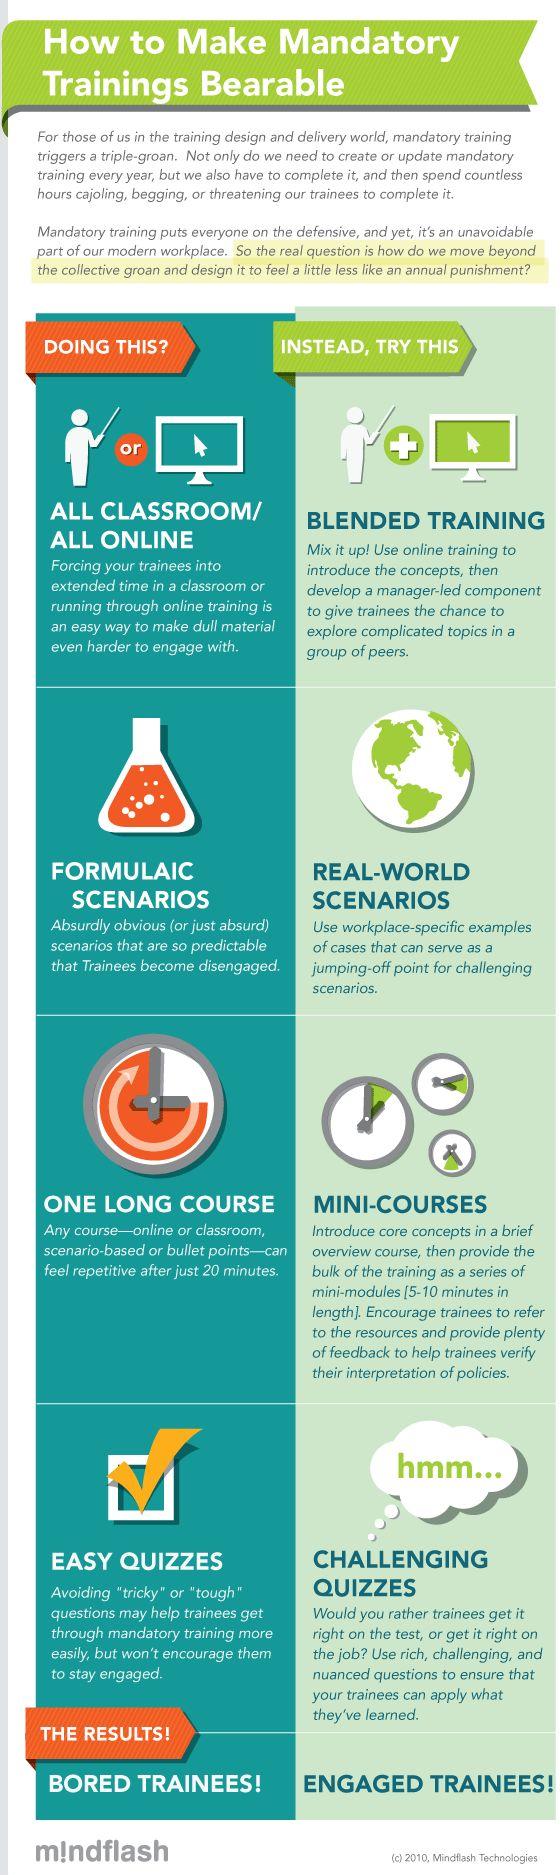 """Make Mandatory Training Bearable"" Infographic"